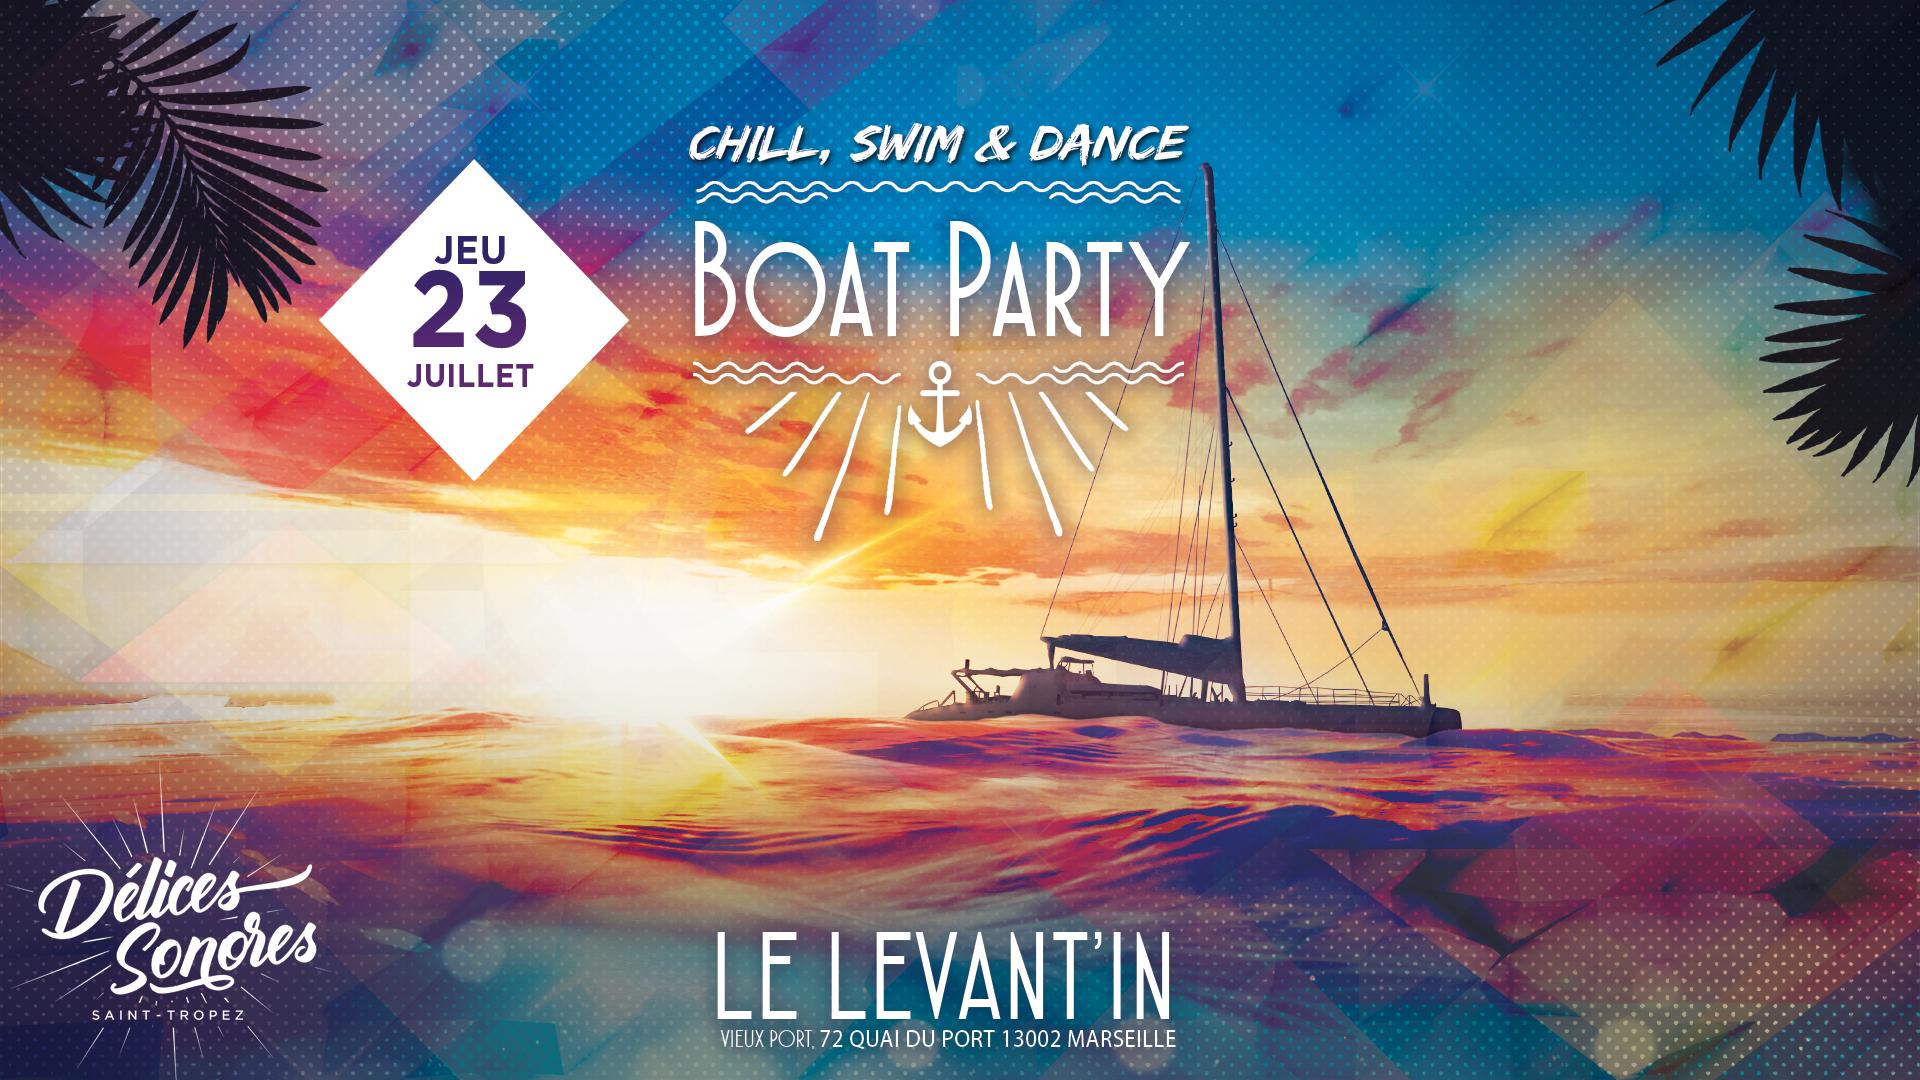 Boat Party - chill, swim & dance  acte II